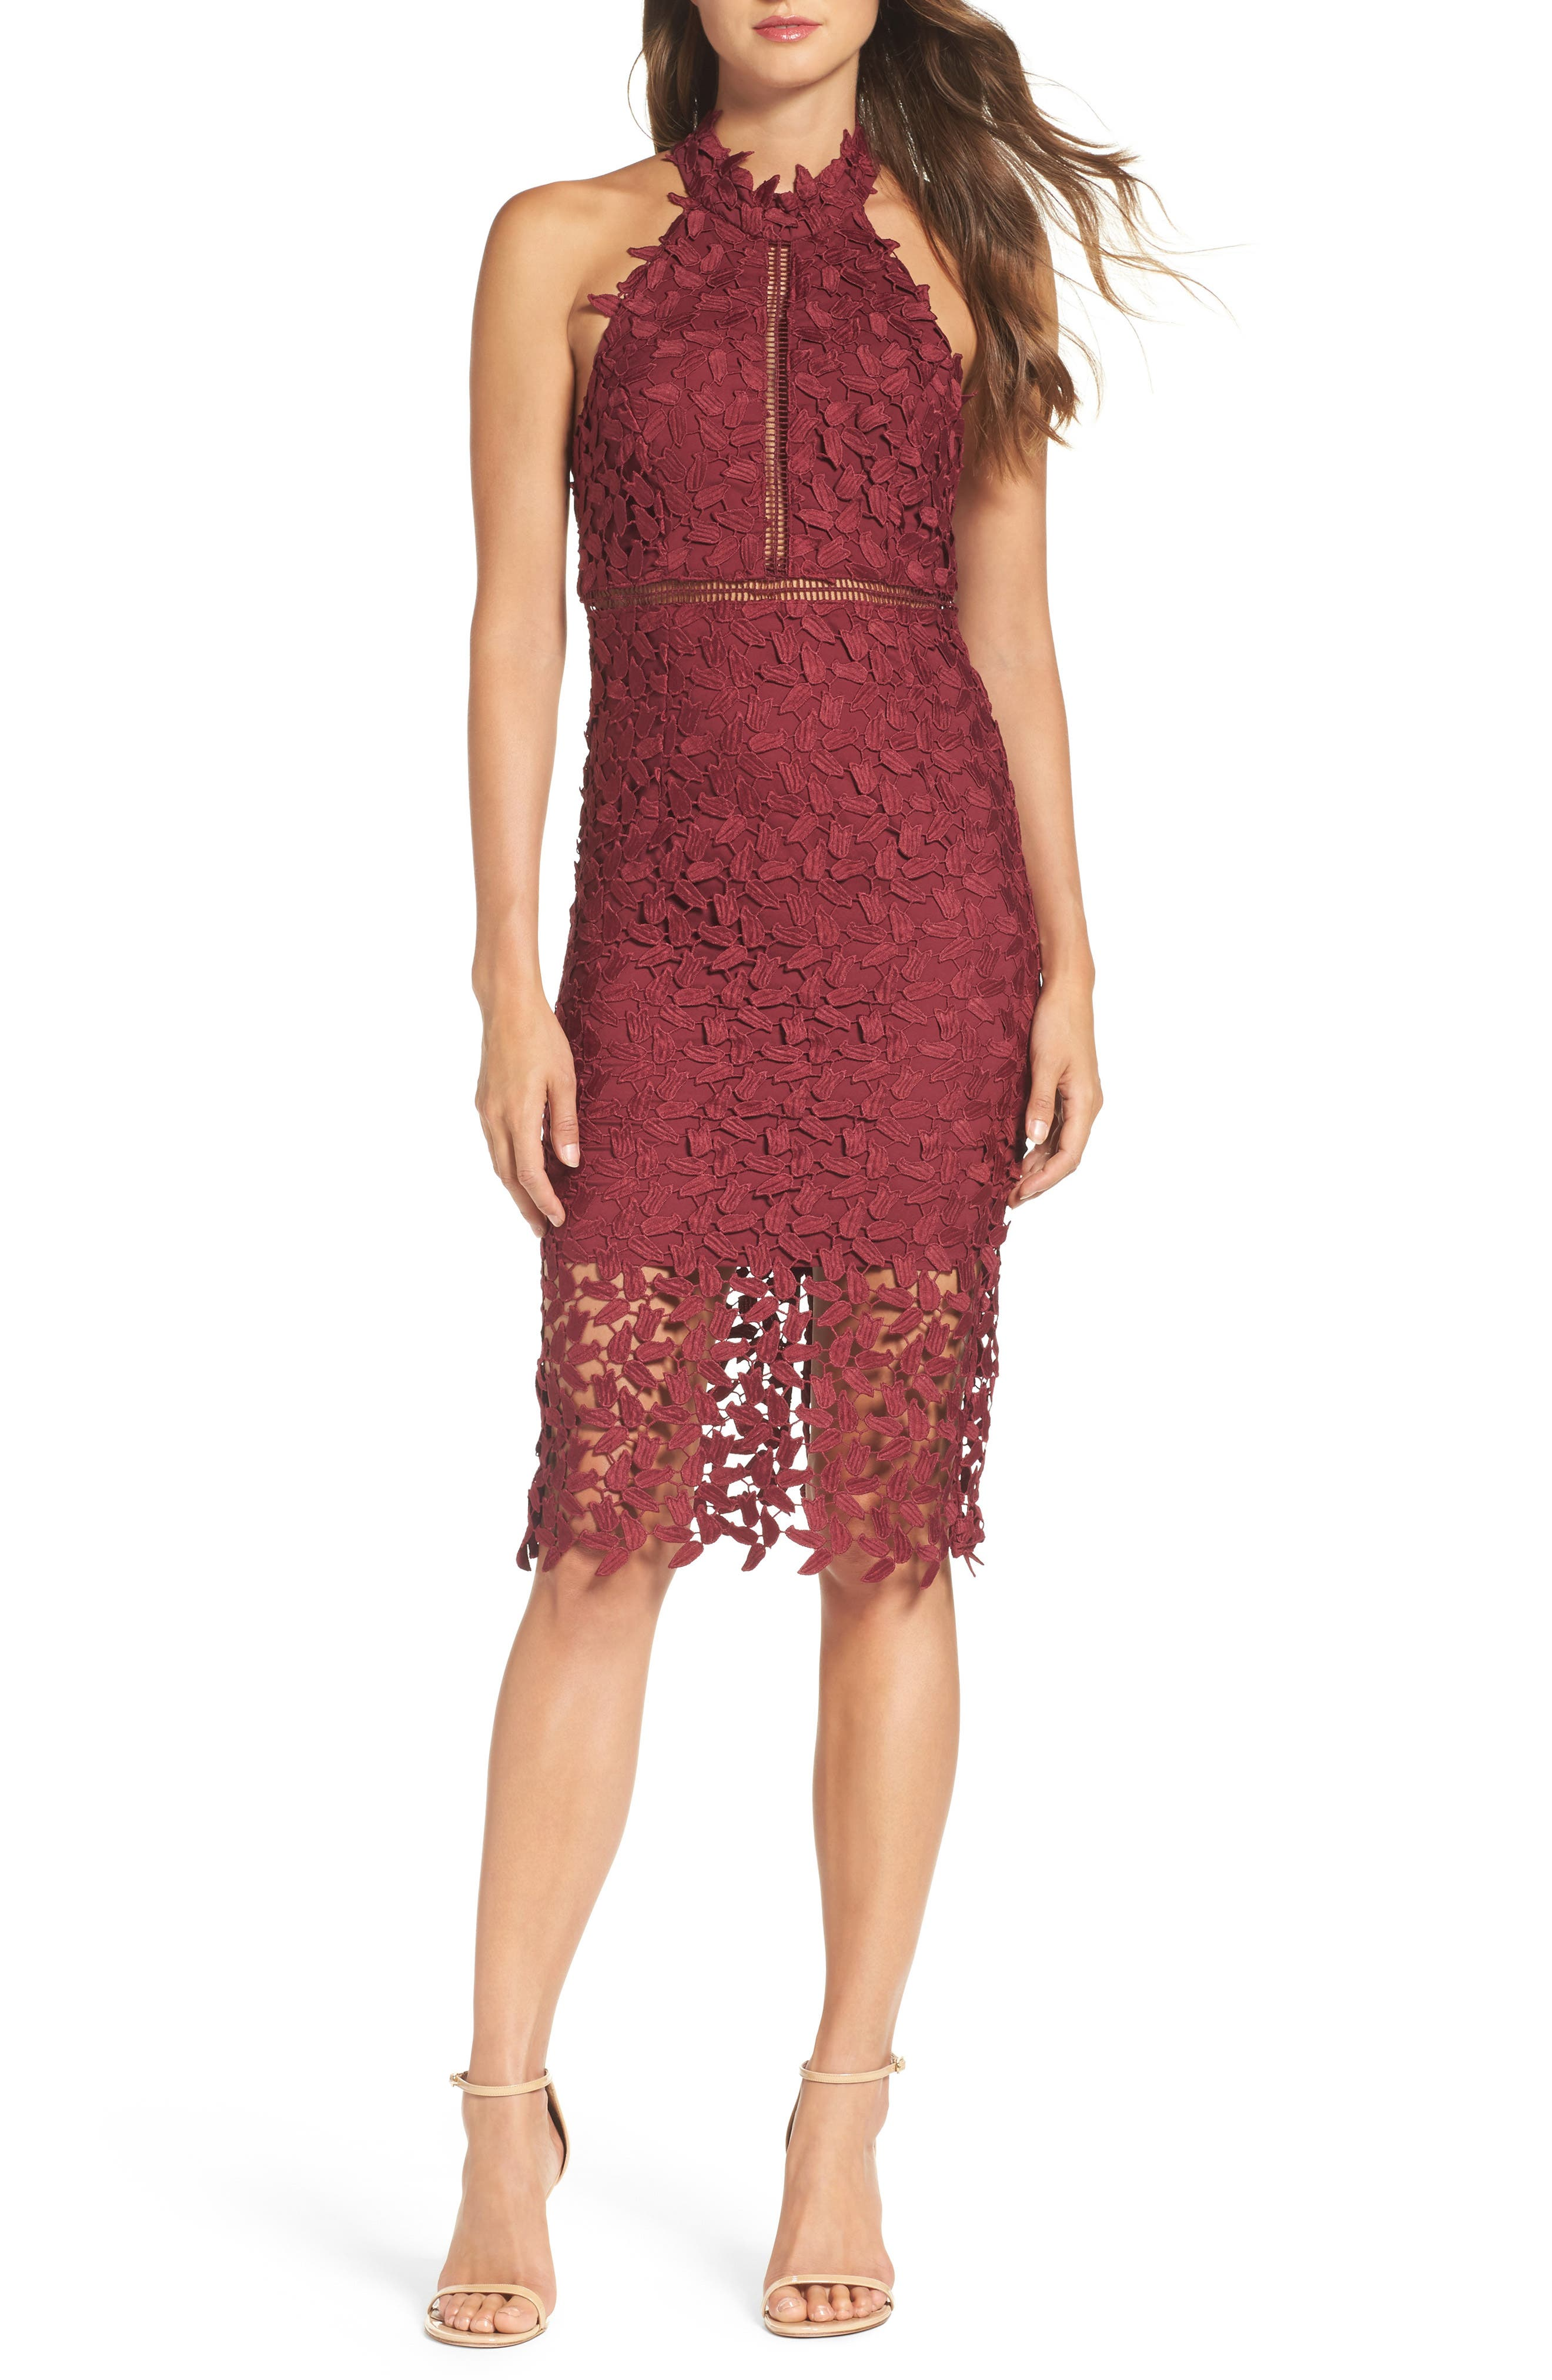 Red evening dress knee length tall